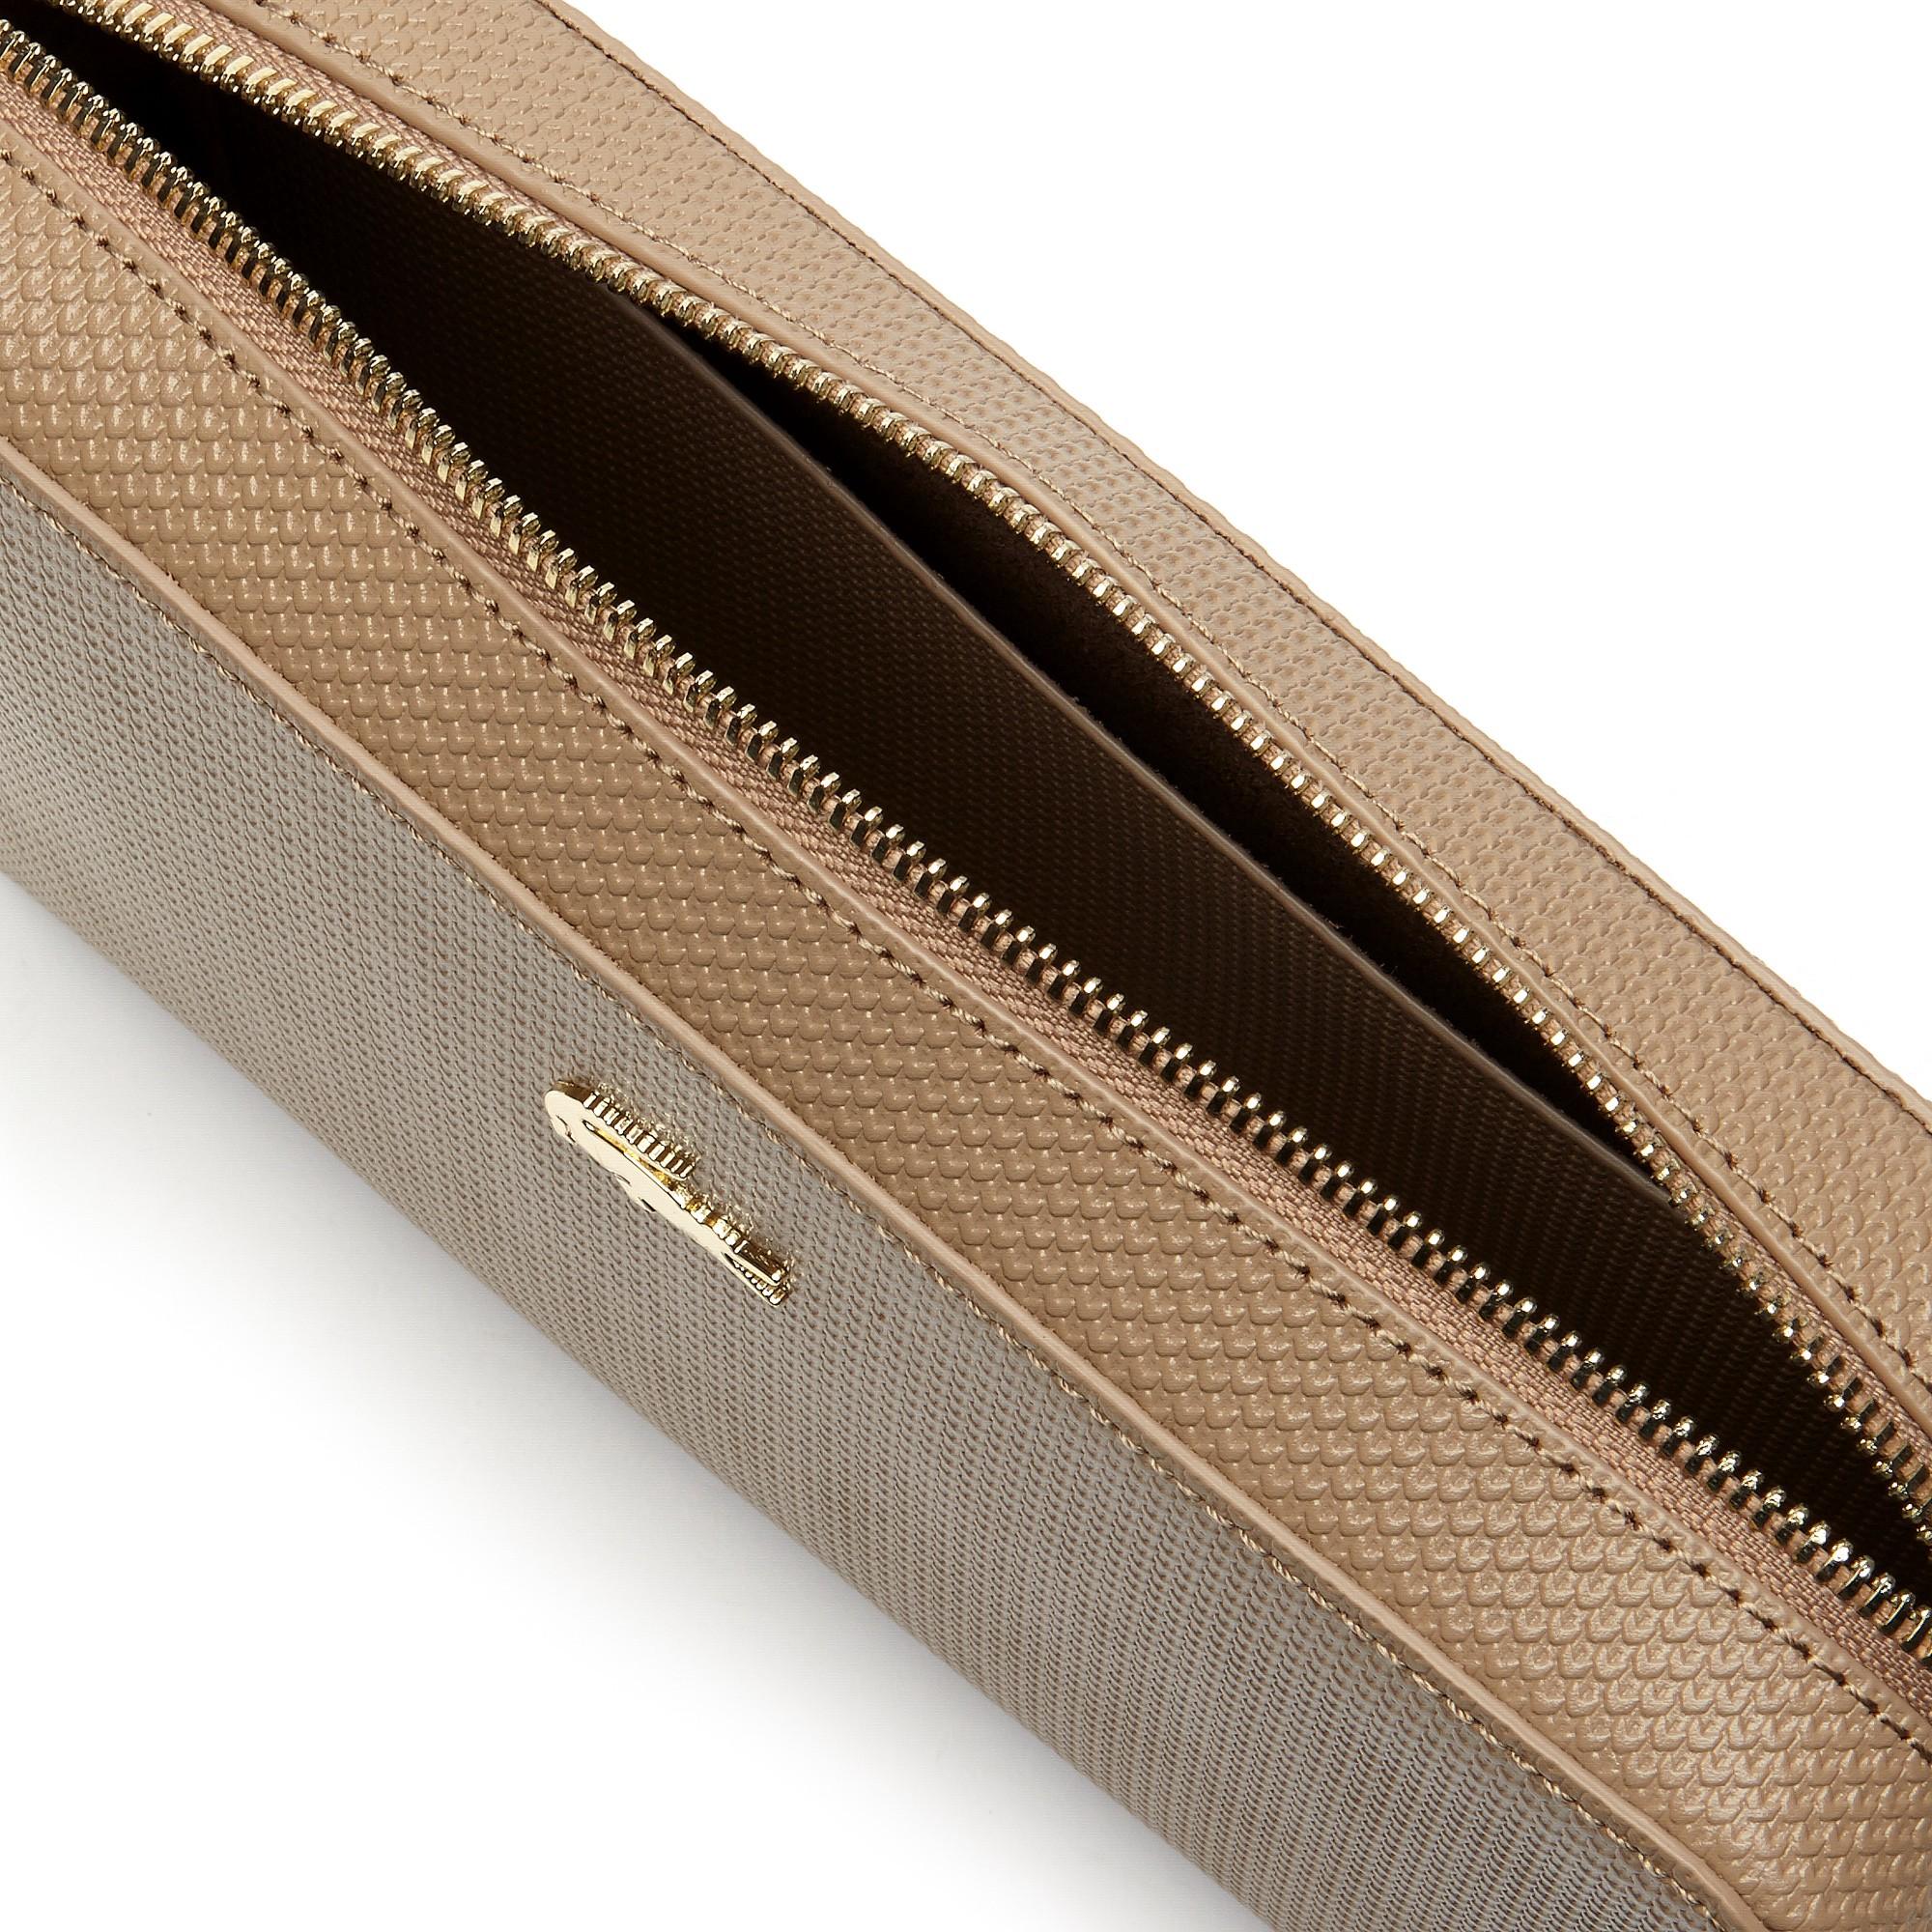 d01abf9da9654 Lacoste Women s Chantaco Piqué Leather Square Crossover Bag - Peacoat Gold